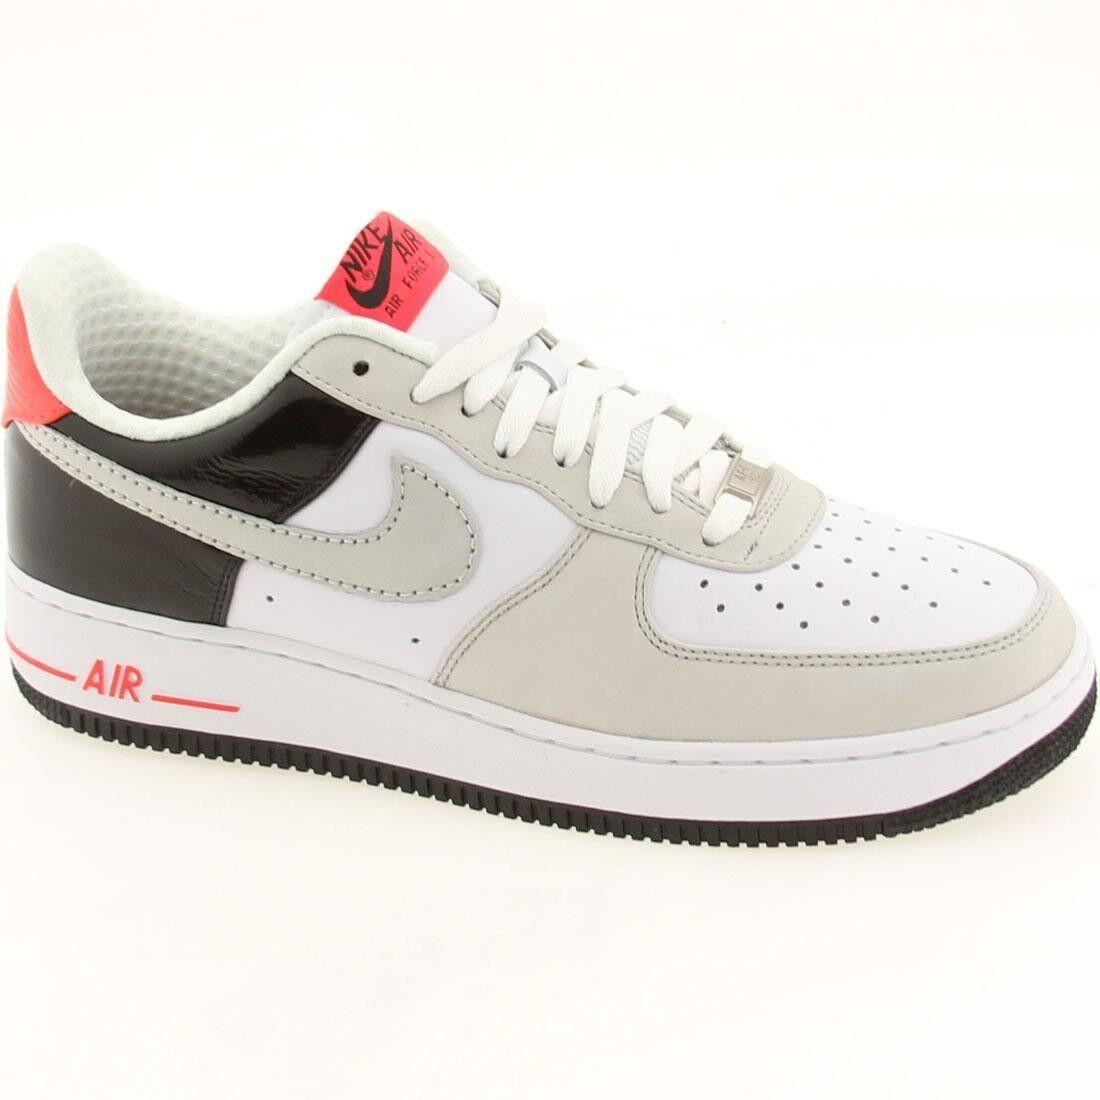 318775-101 Nike Air Obliger 1 07 faible Premium -Max Gris 90 Edition blanc  Gris -Max  Infrarouge 3a9104